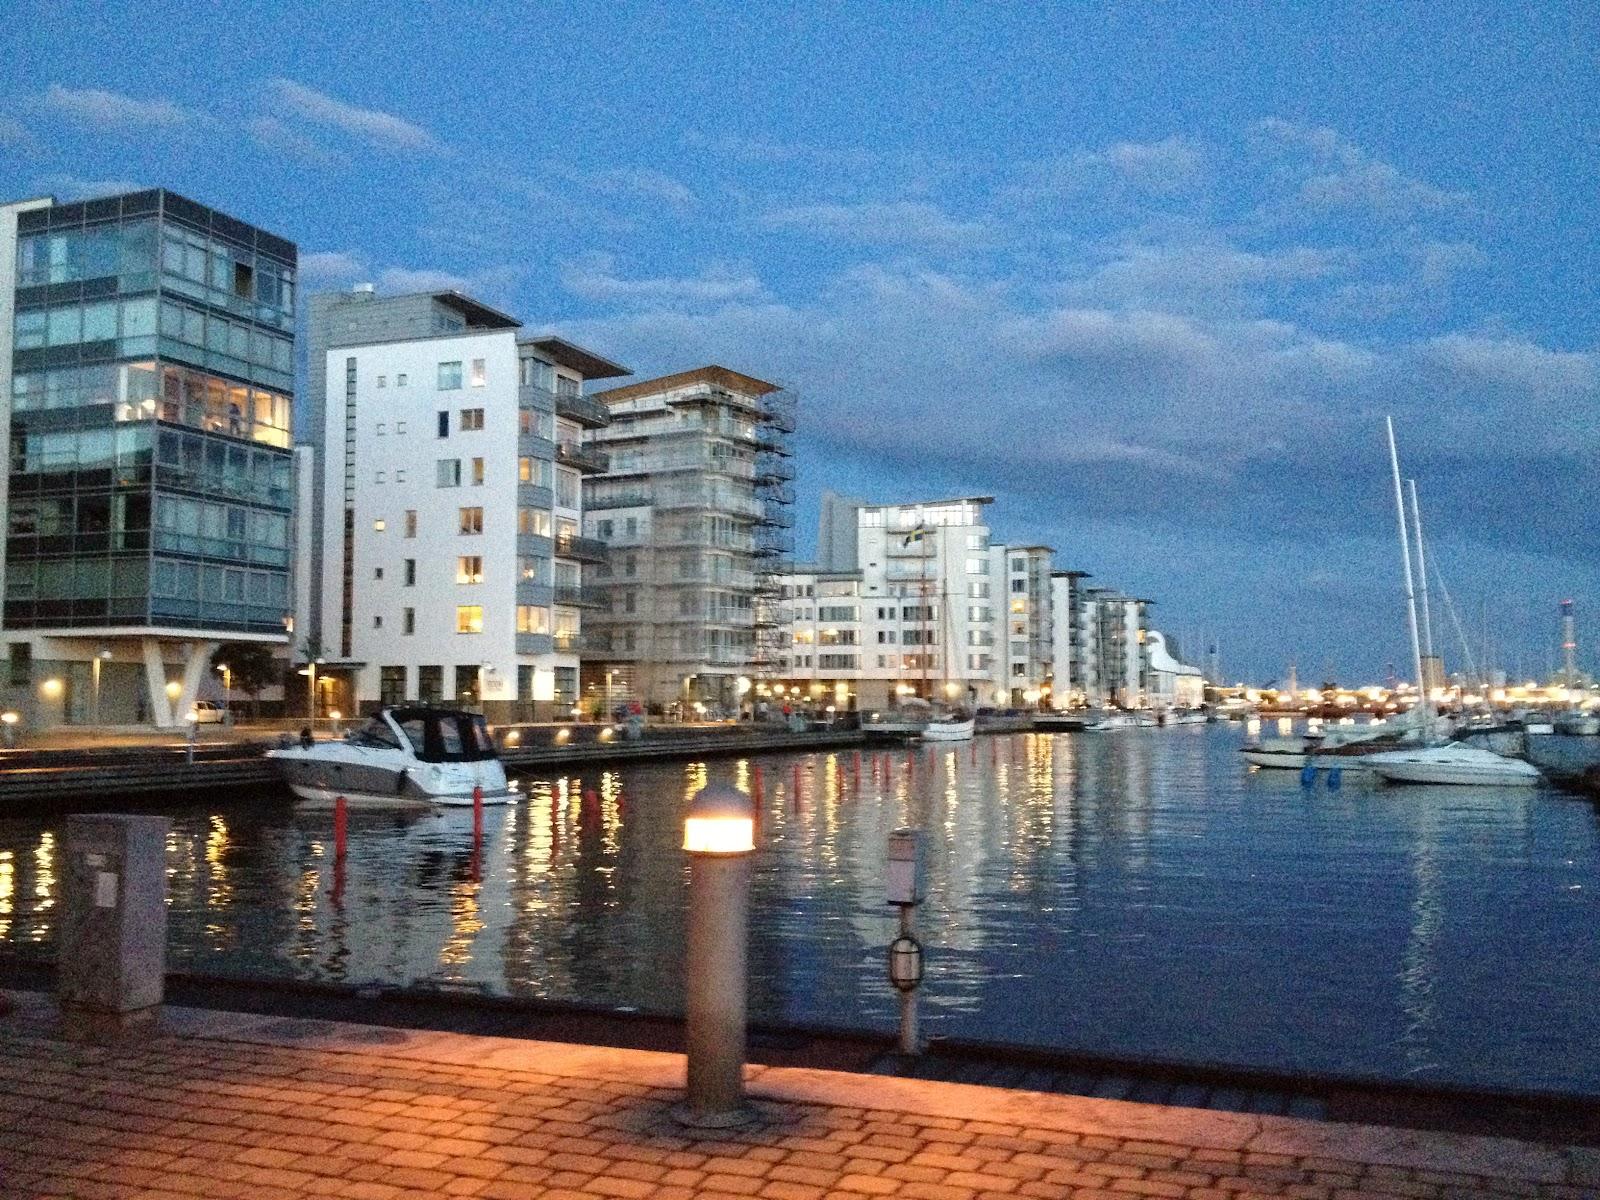 äkta japanesse mager i Helsingborg